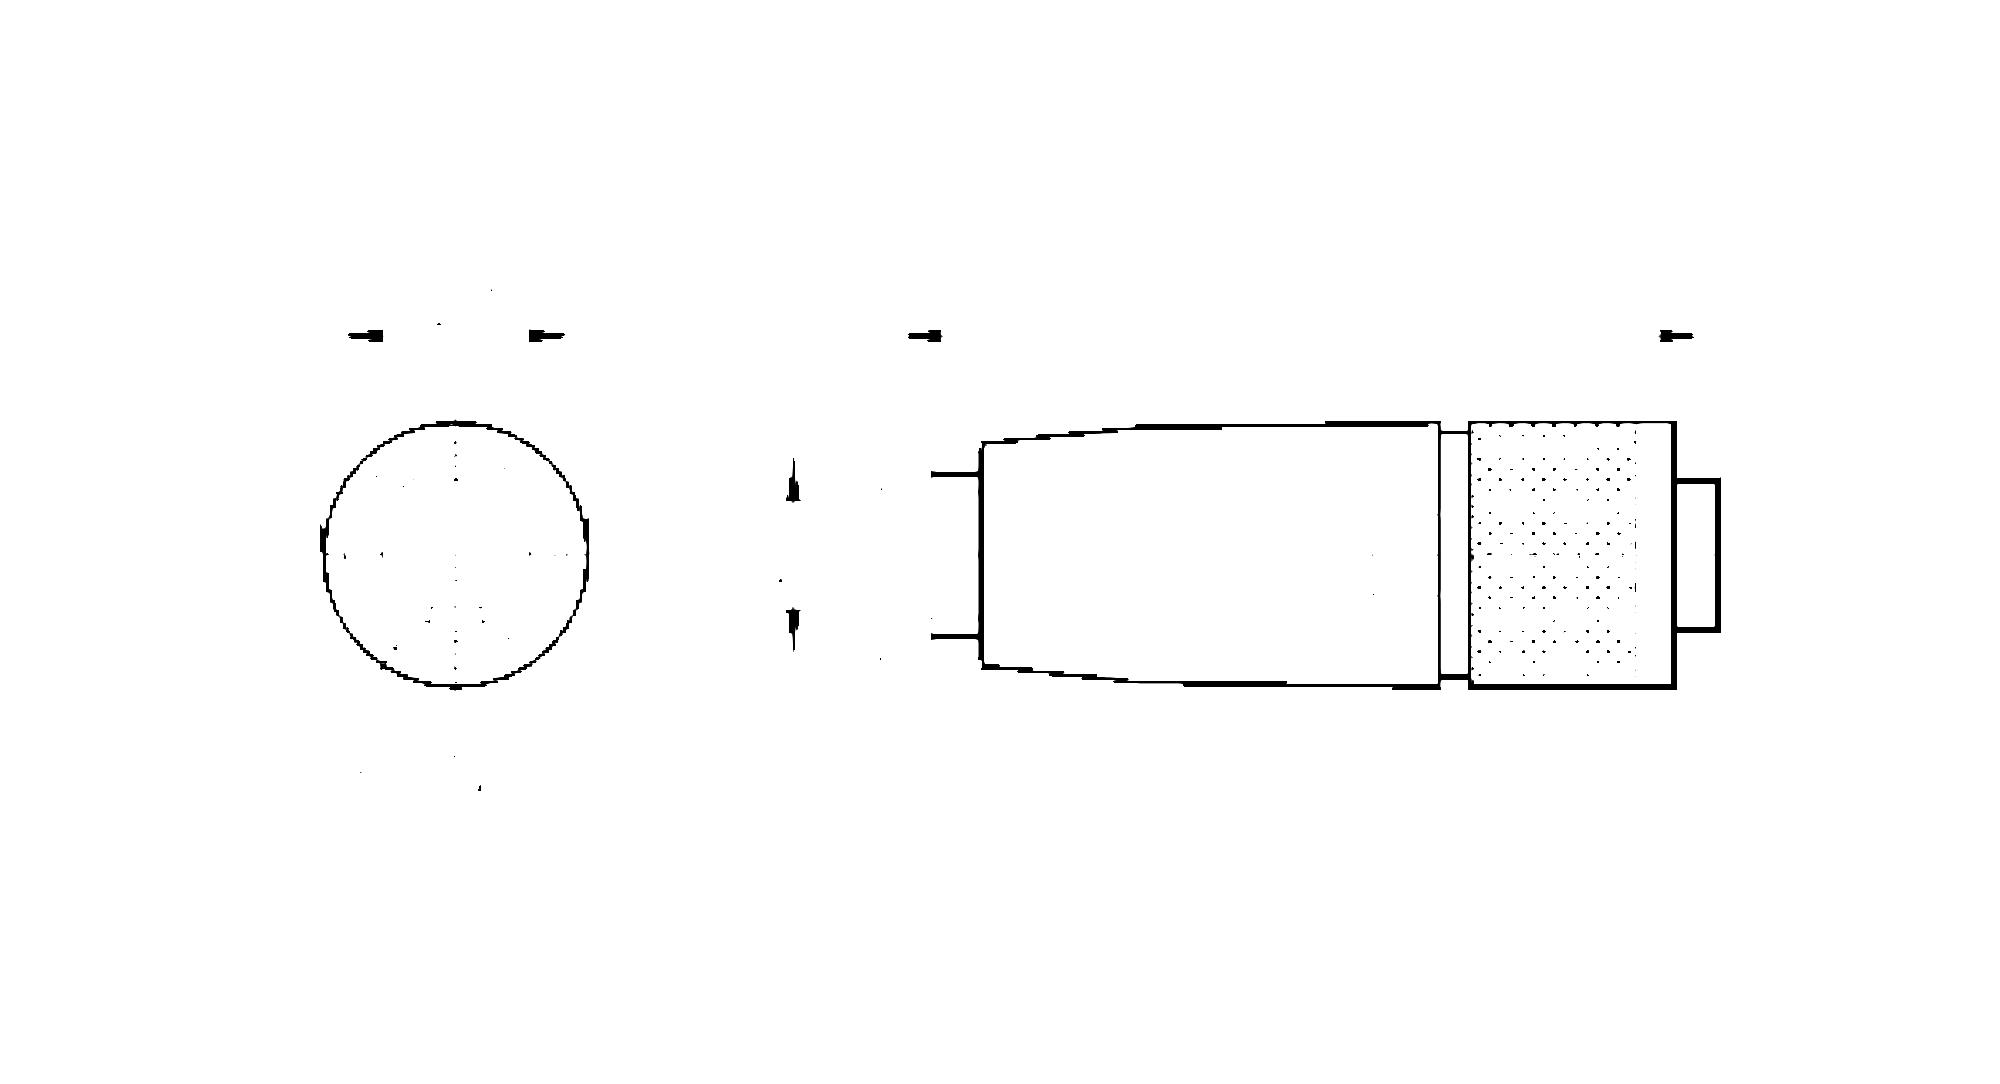 l34121 - female wirable connectors